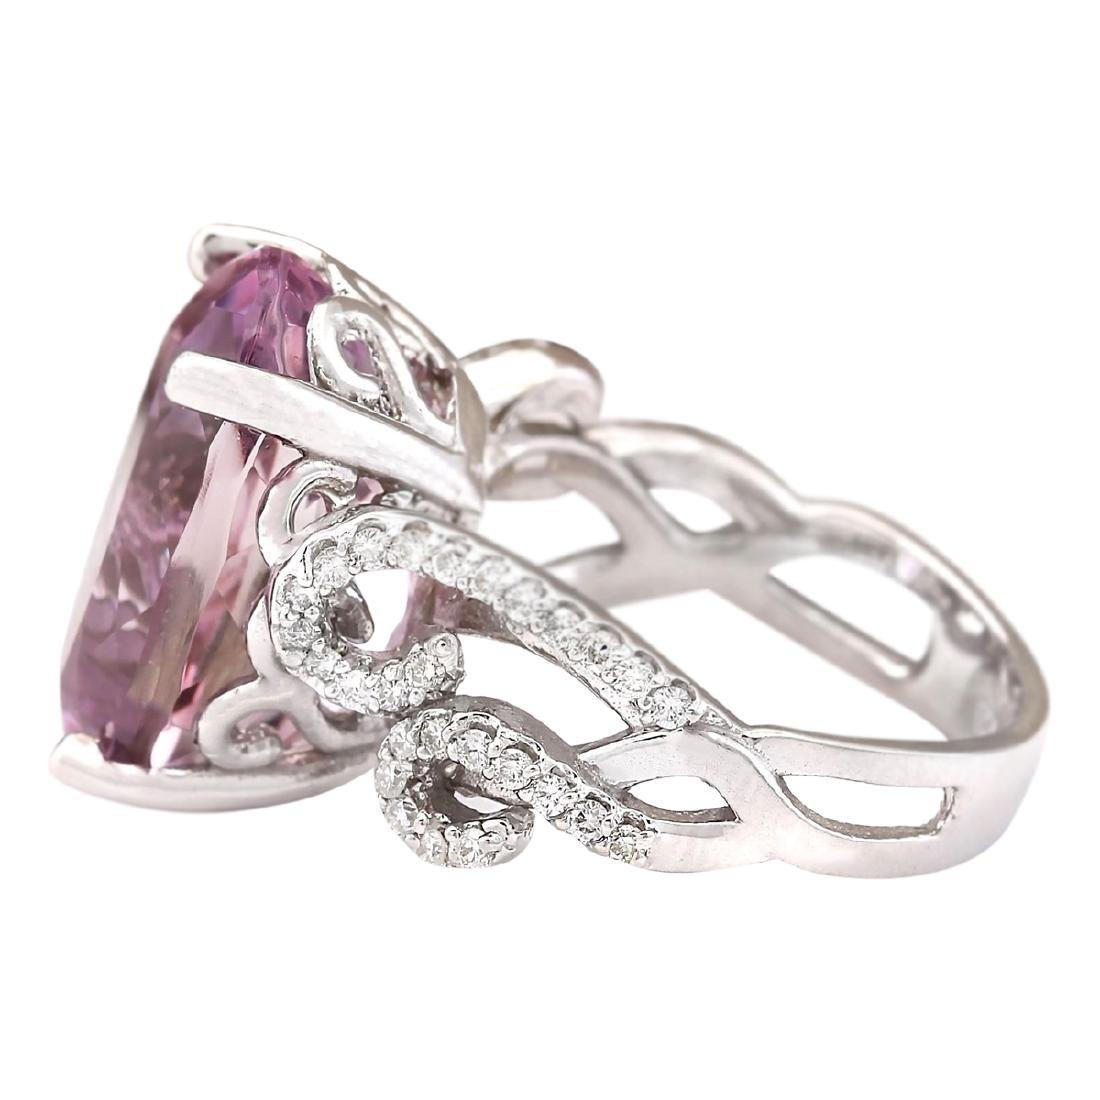 13.86 CTW Natural Kunzite And Diamond Ring In 18K White - 3